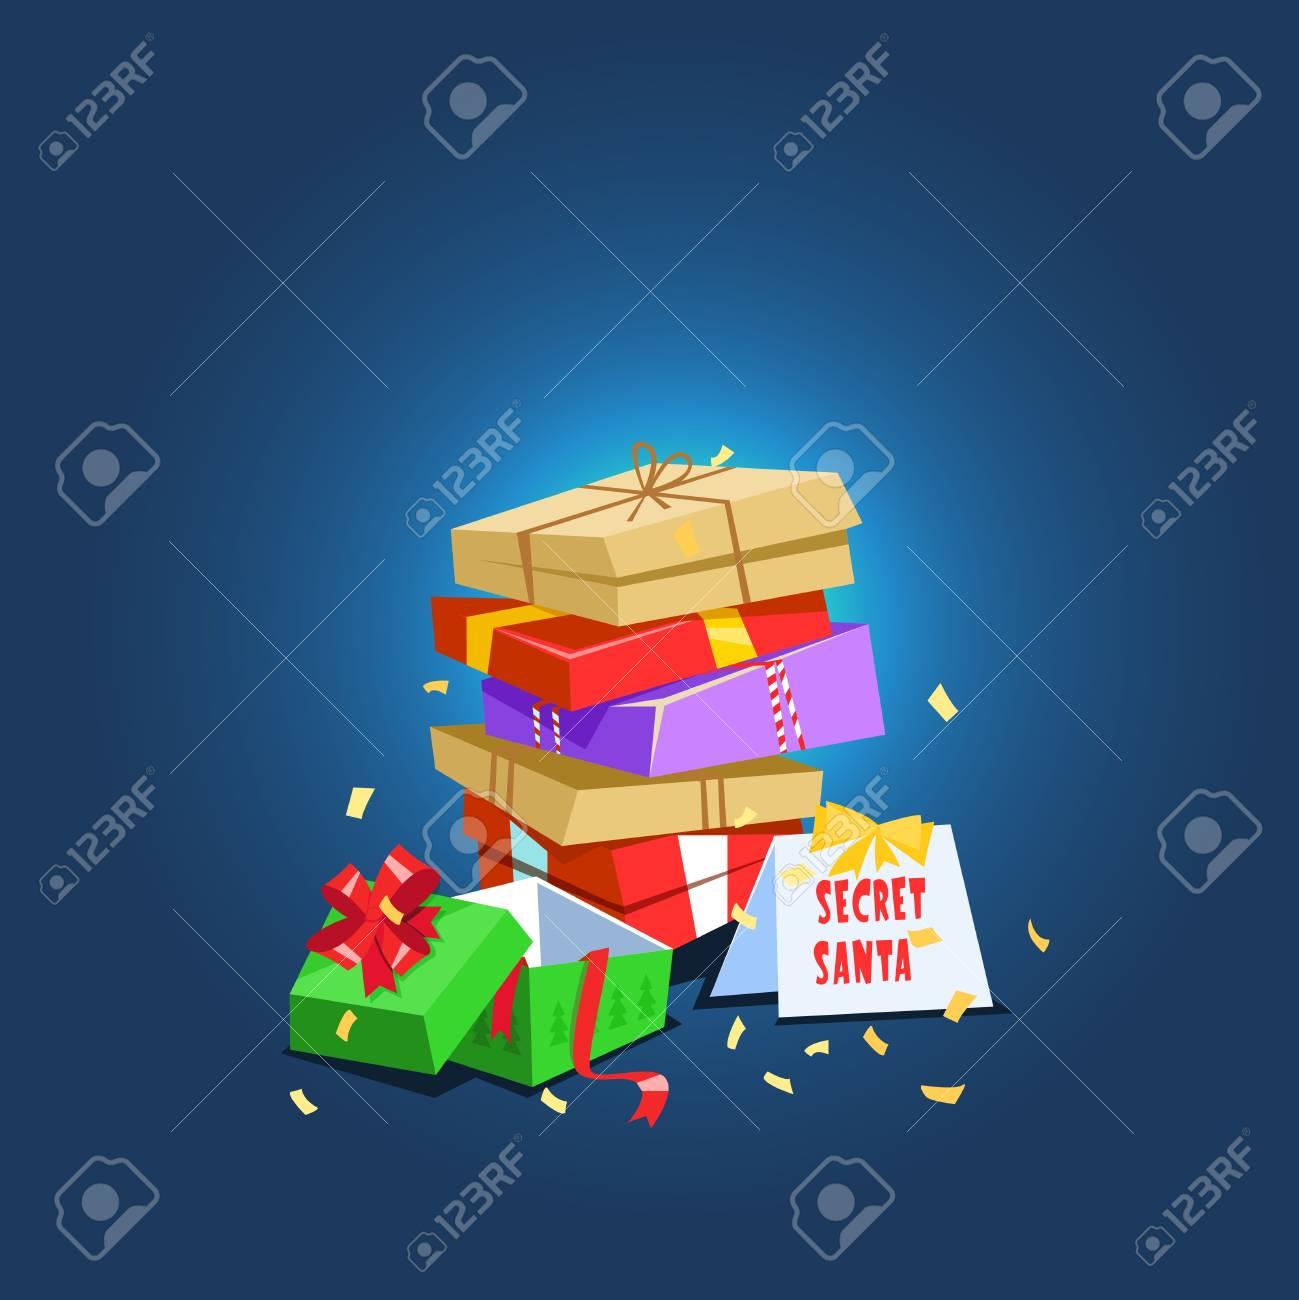 Christmas Celebration Cartoon Images.Vector Illustration Present Secret Santa Christmas Celebration